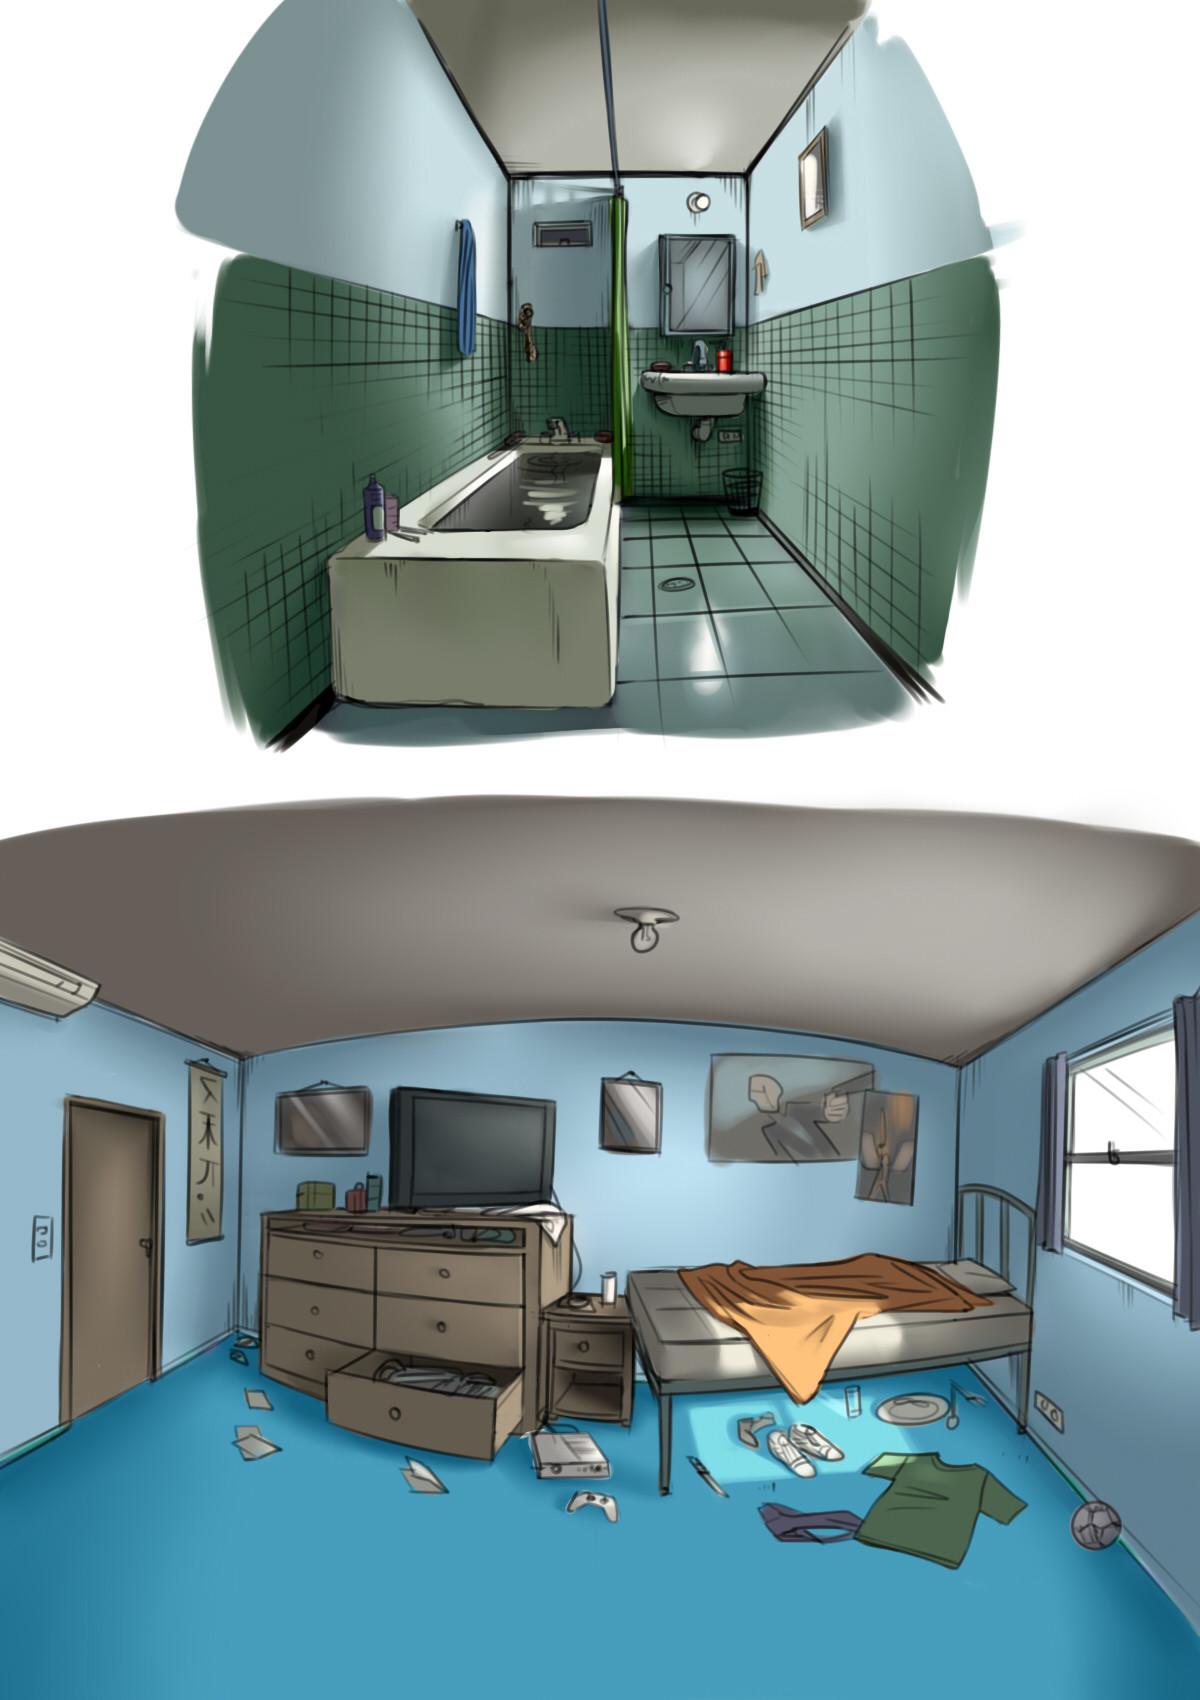 Steven galvan bucky home concept art